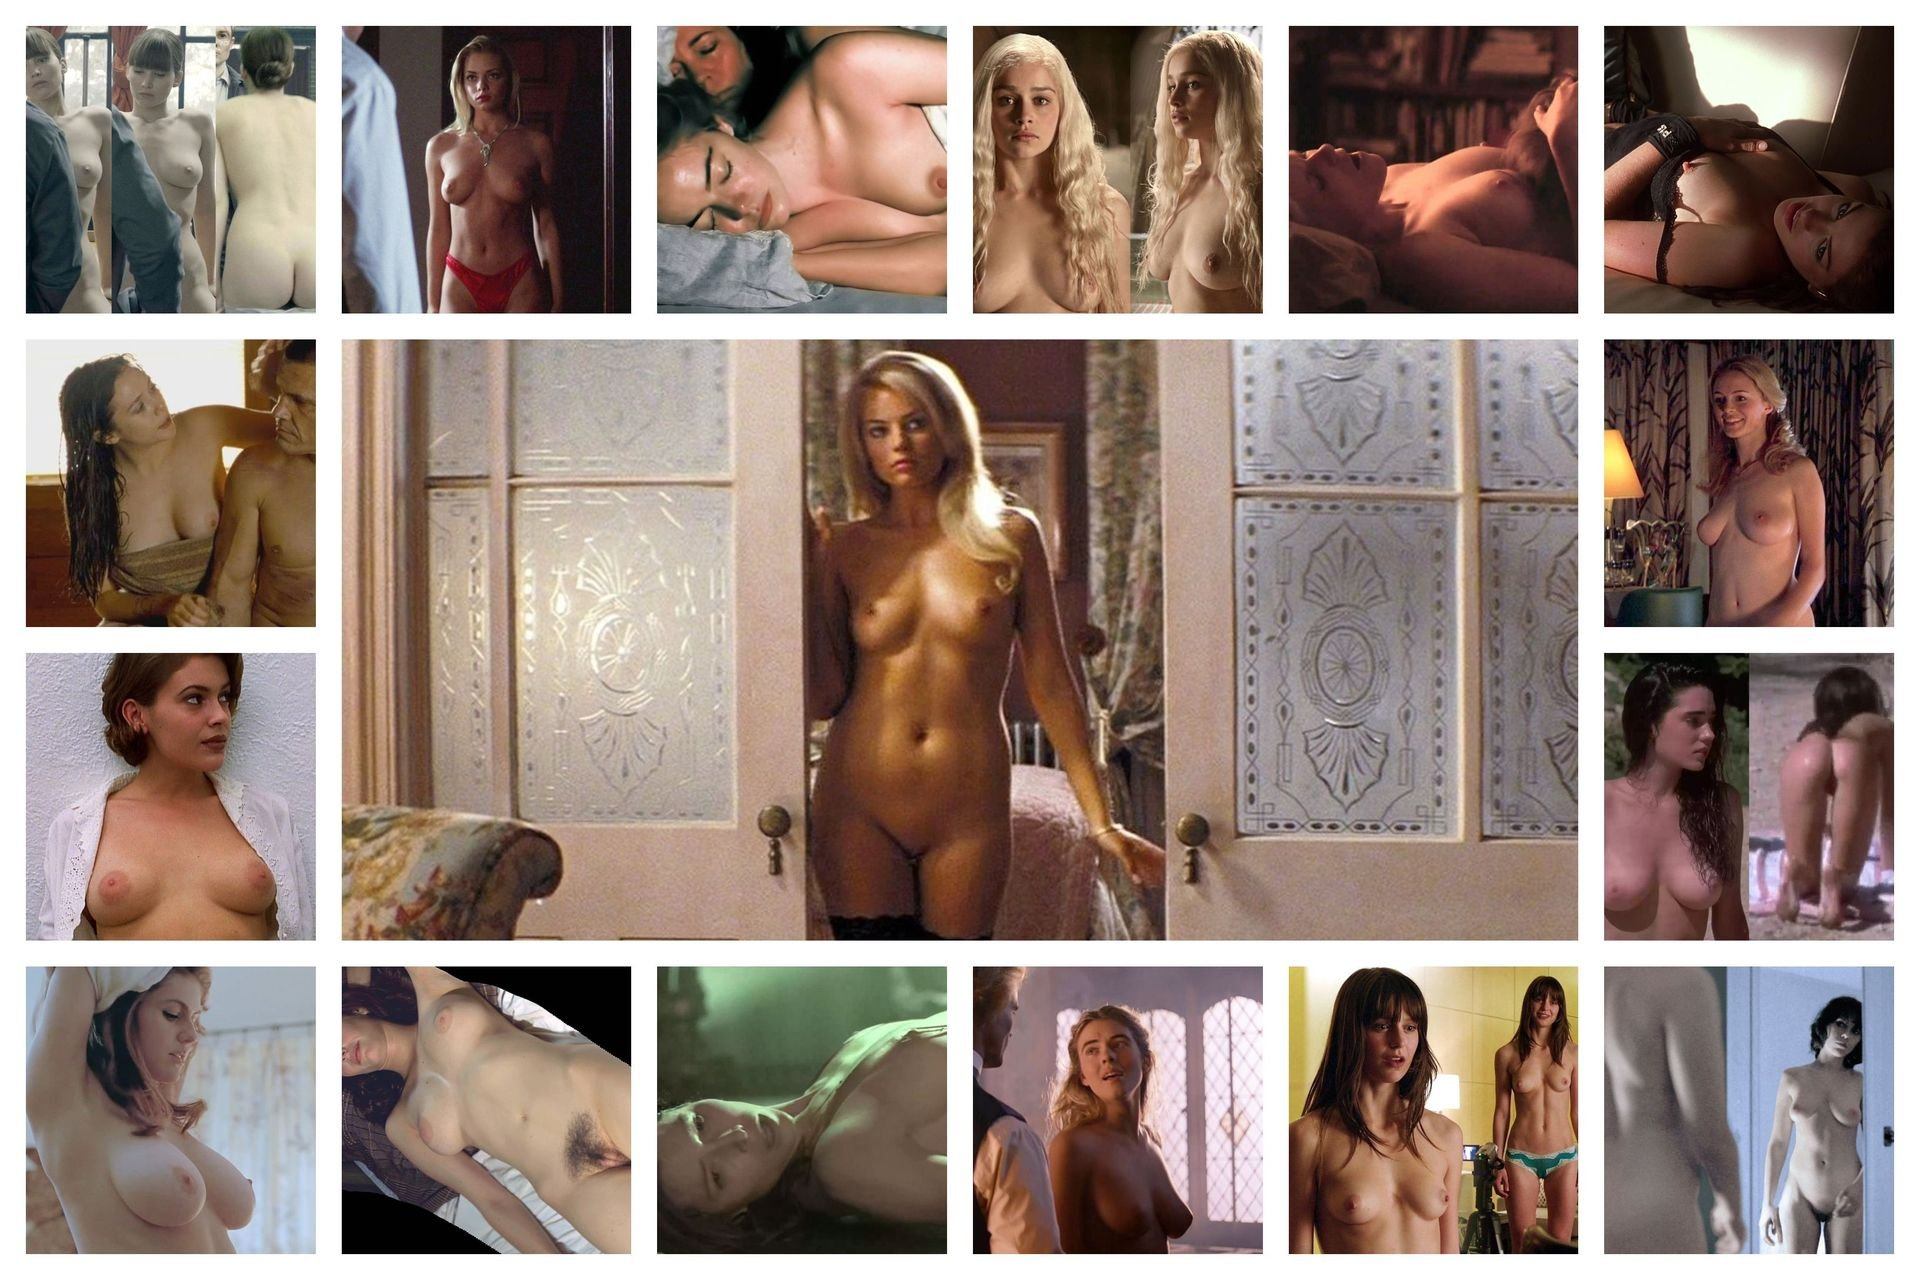 Debby ryan having sex pics porno woman site